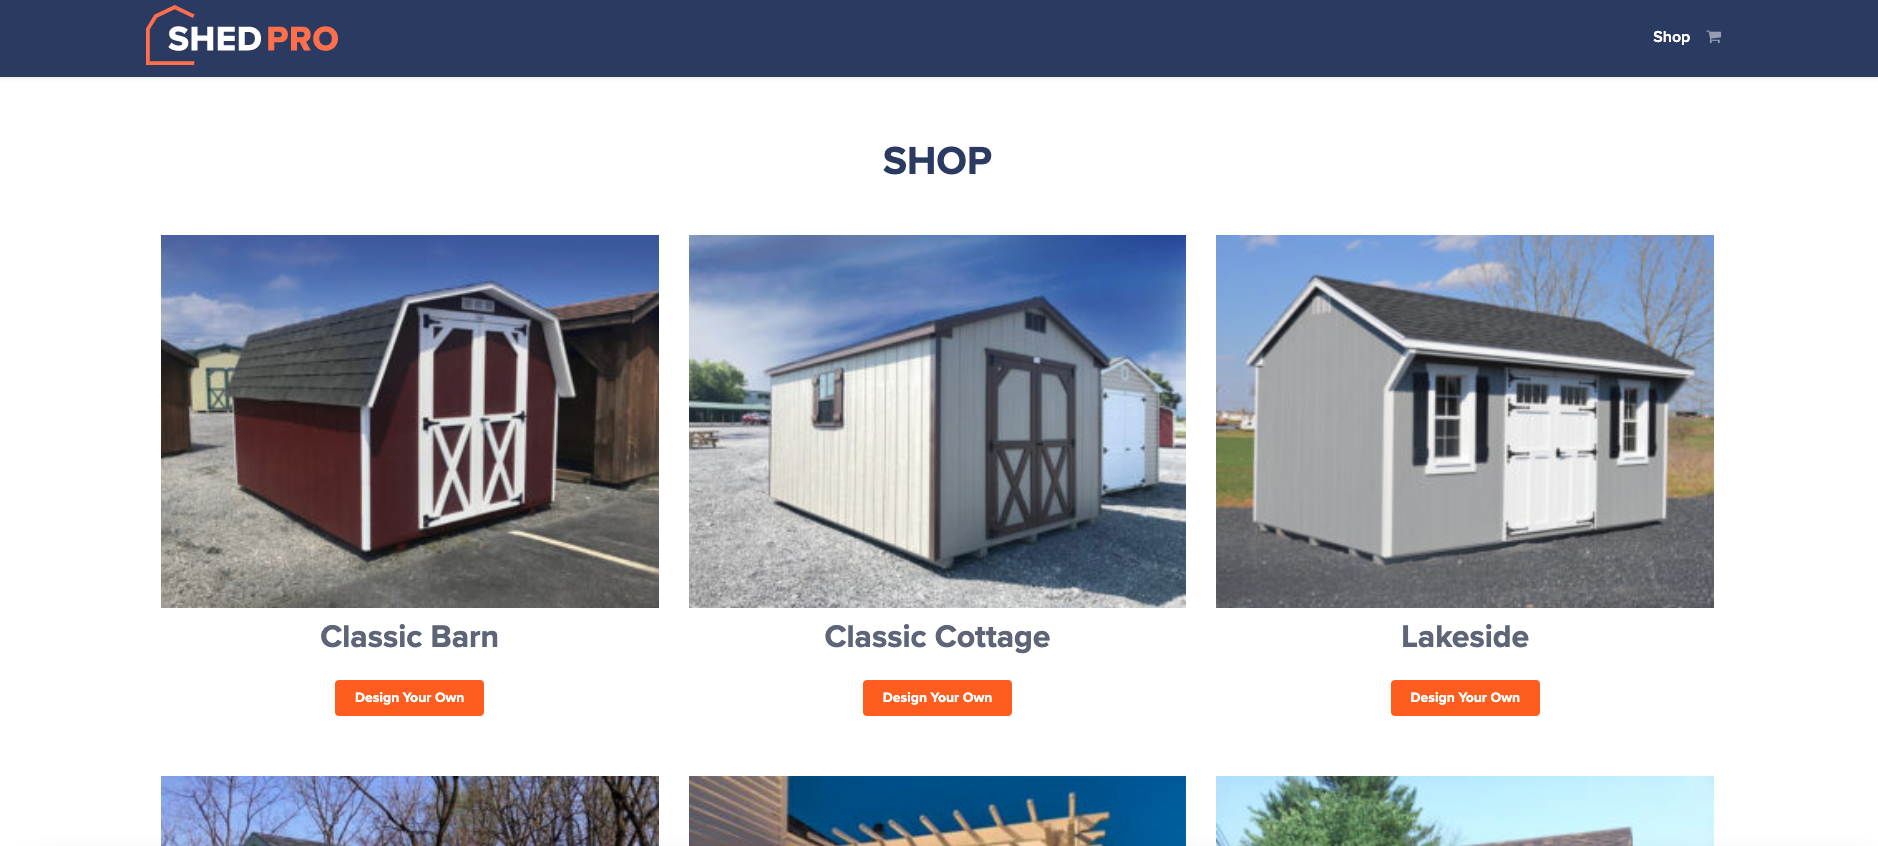 ShedPro custom page design